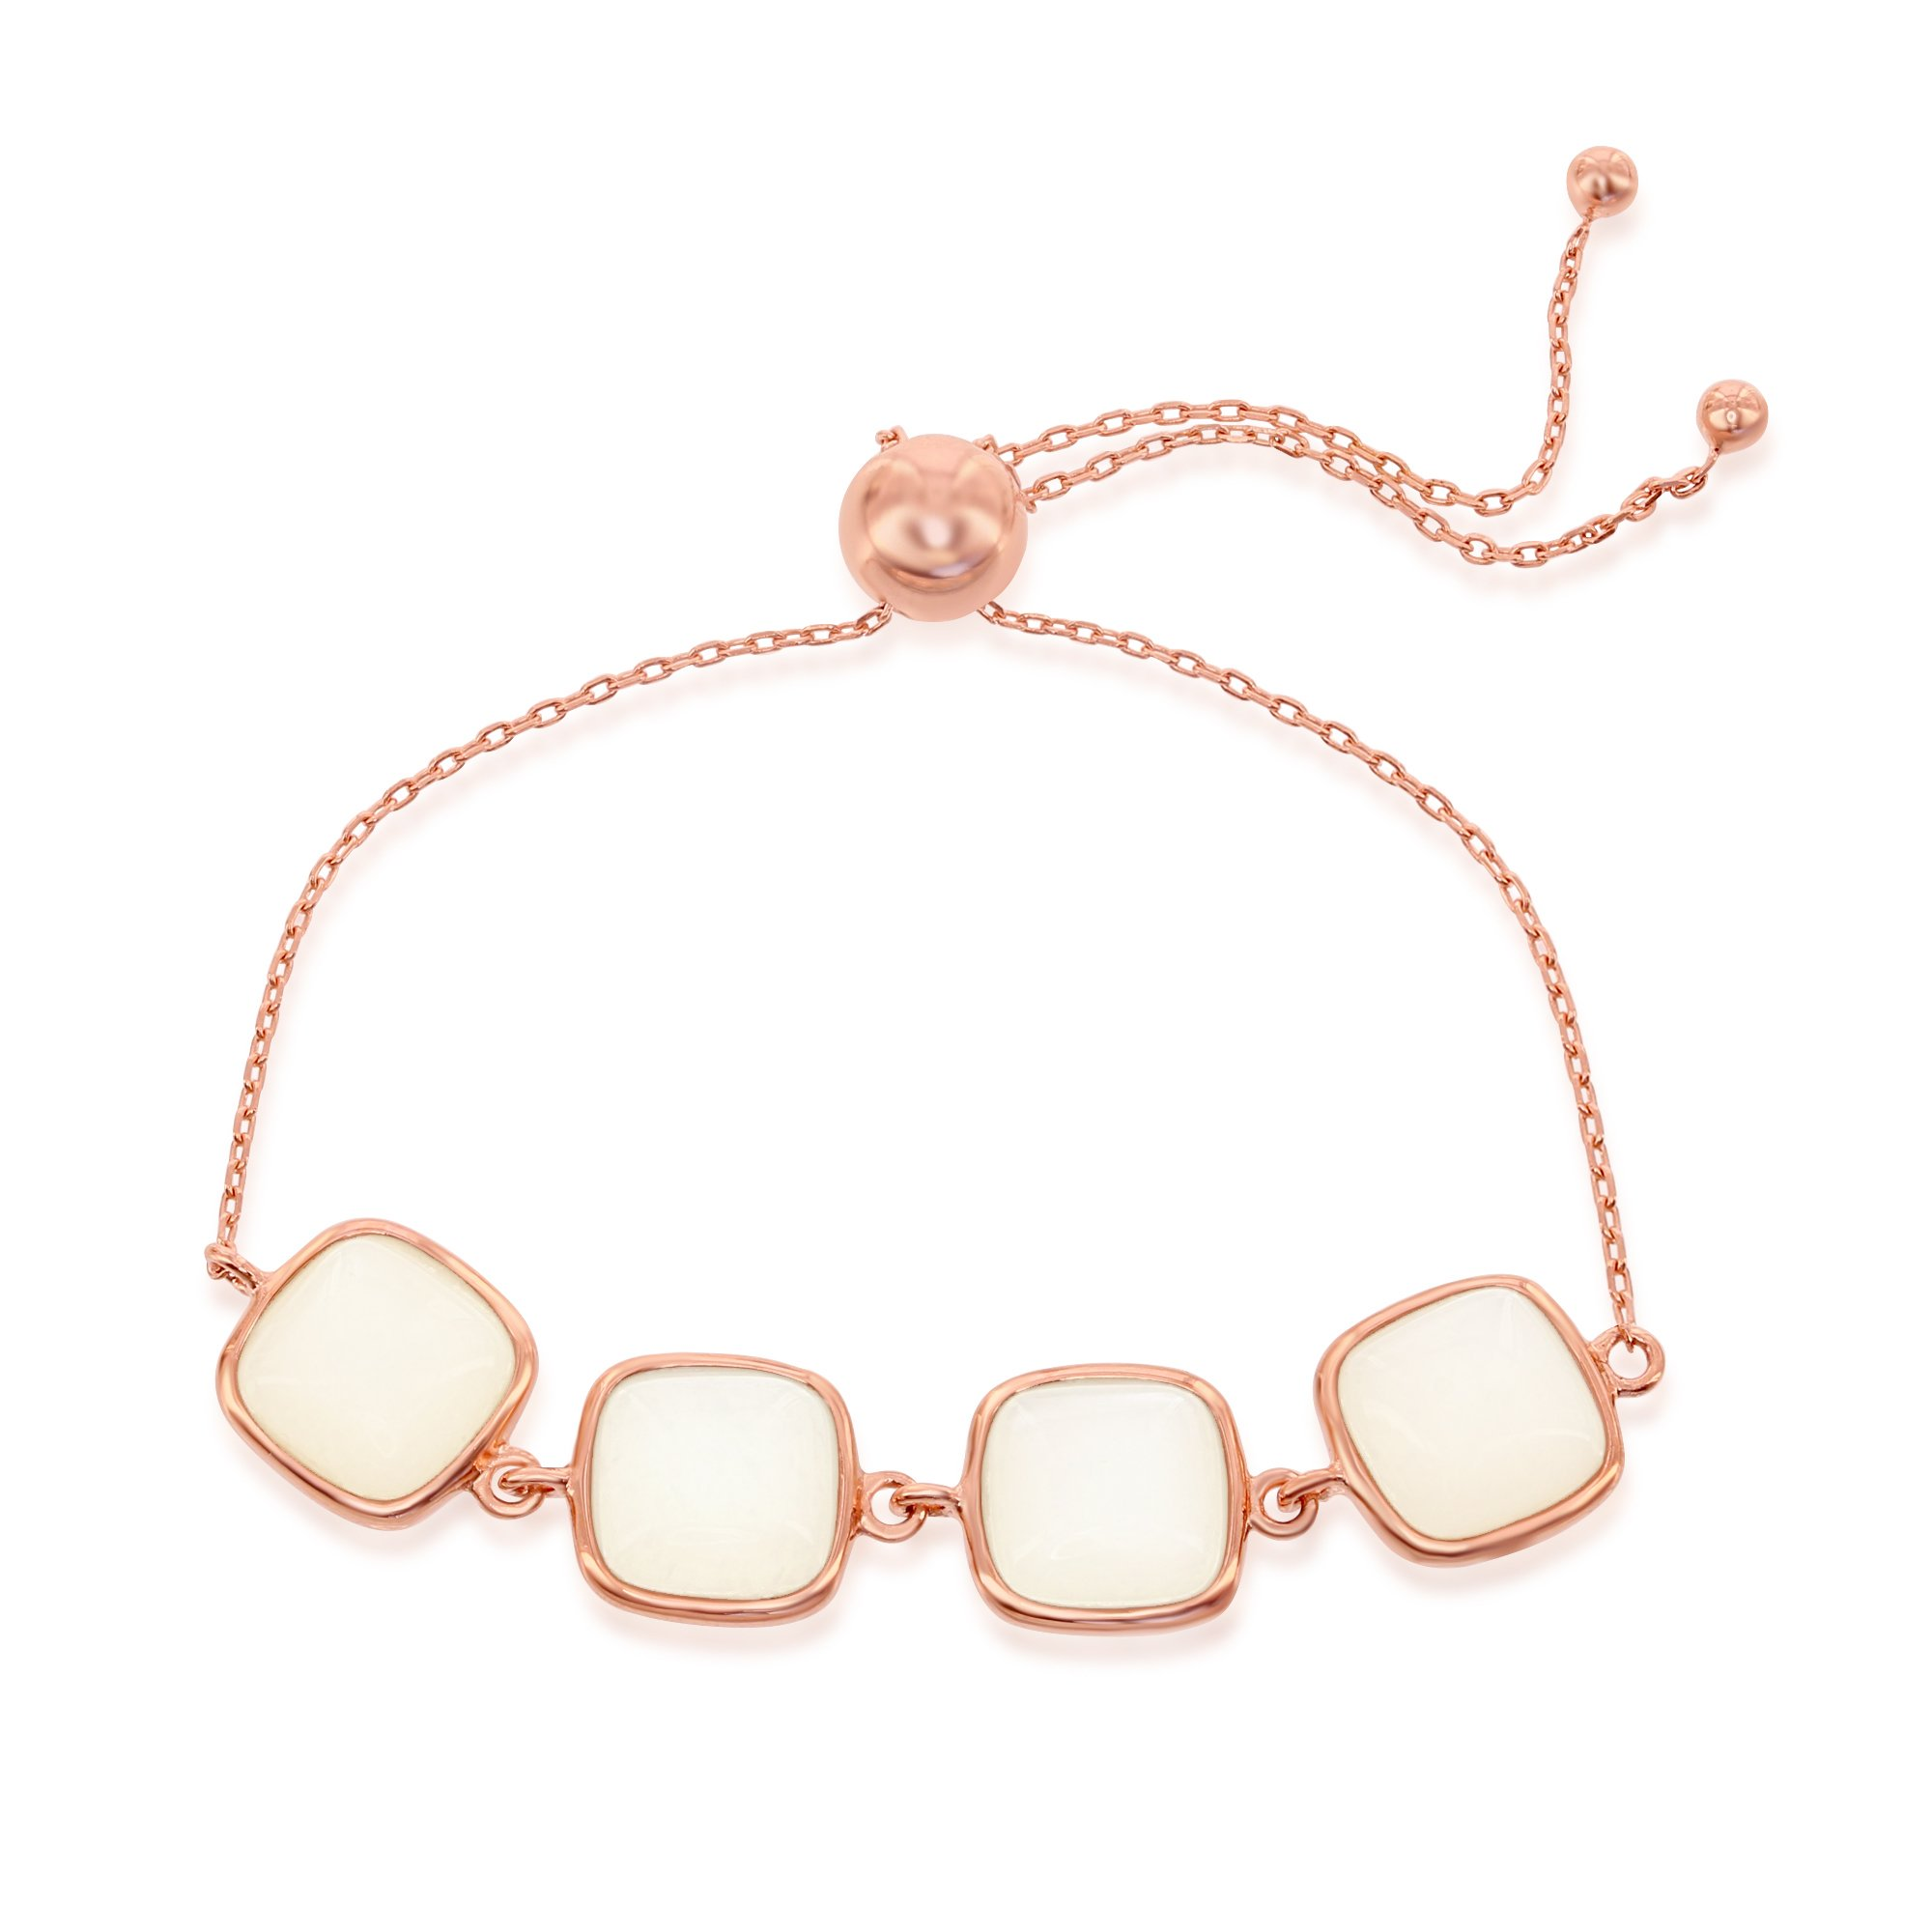 Sterling Silver Italian High Polish Rose Tone Natural White Moonstone Adjustable Bolo Bracelet